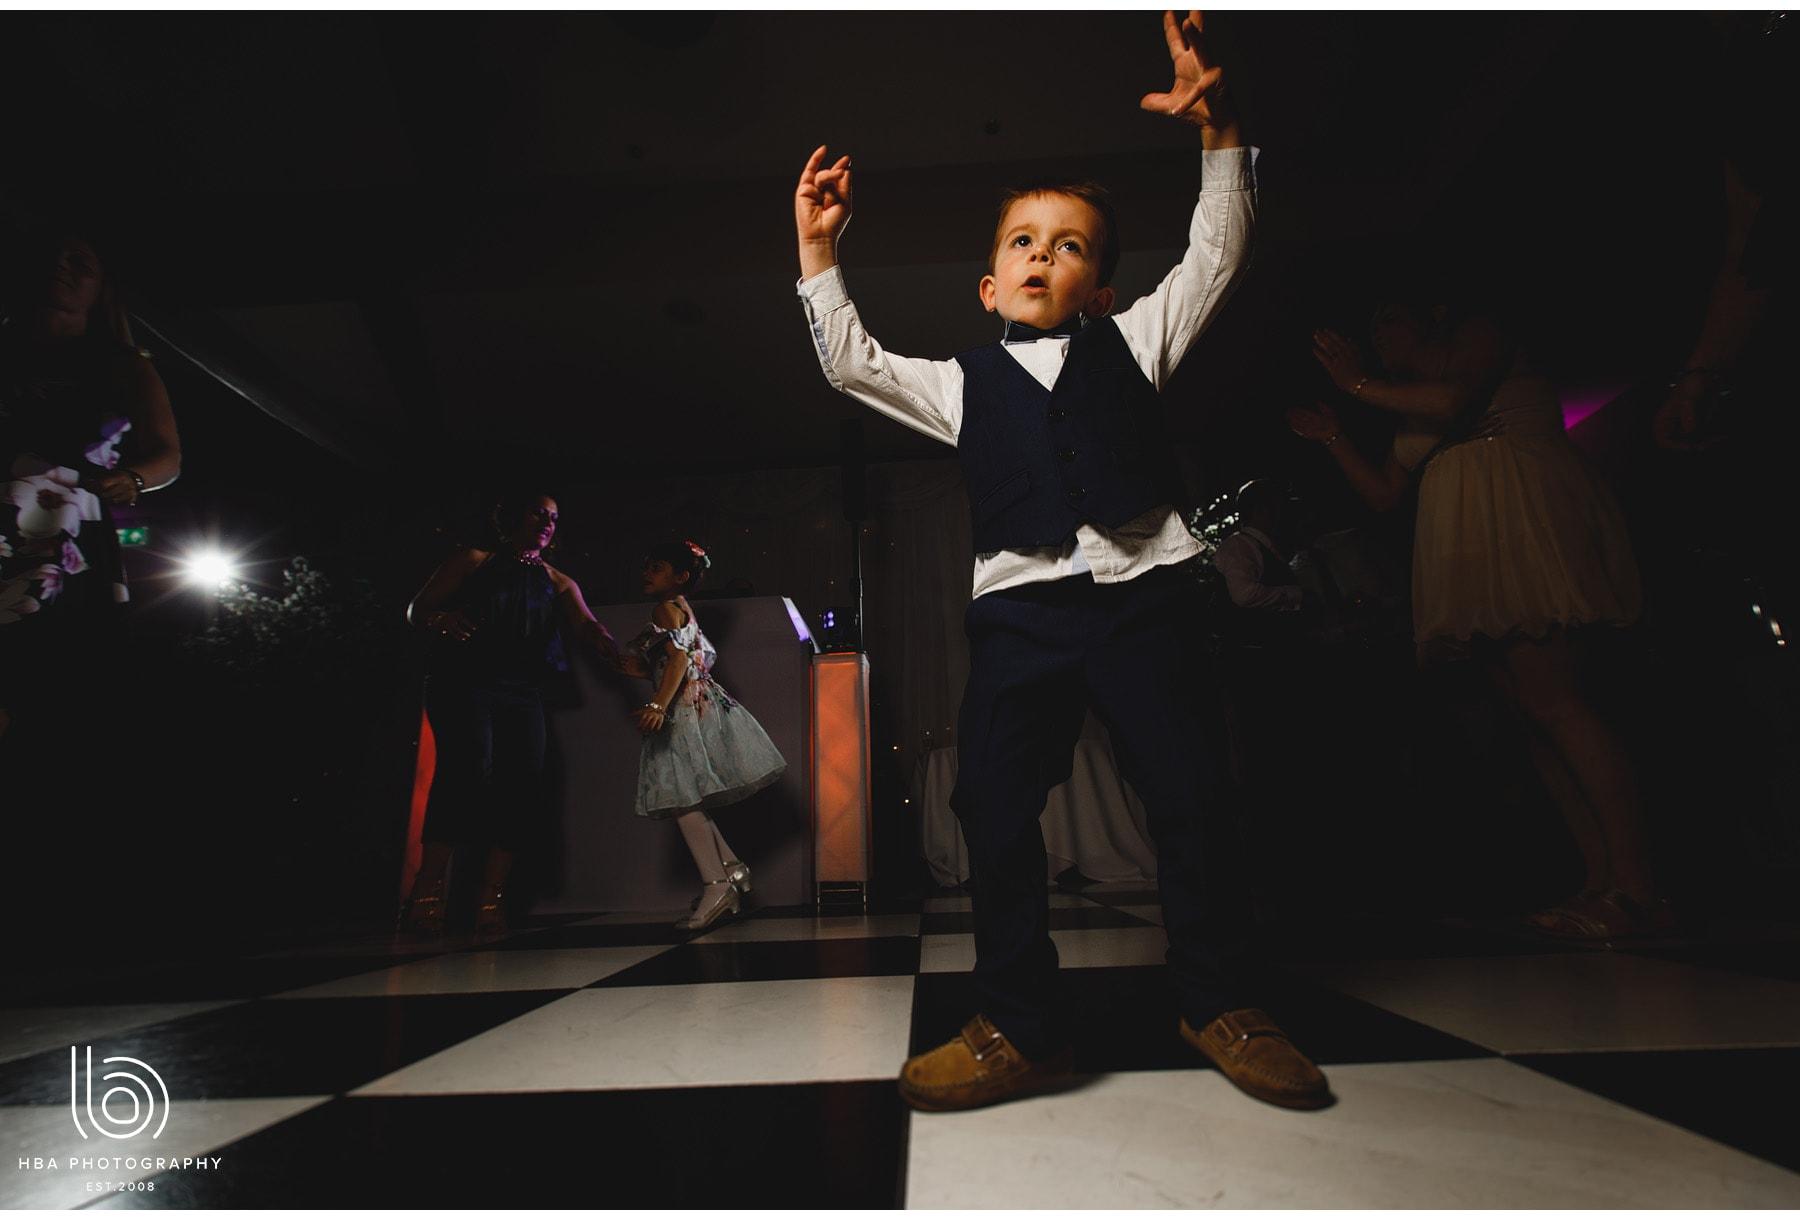 kids on the dancefloor